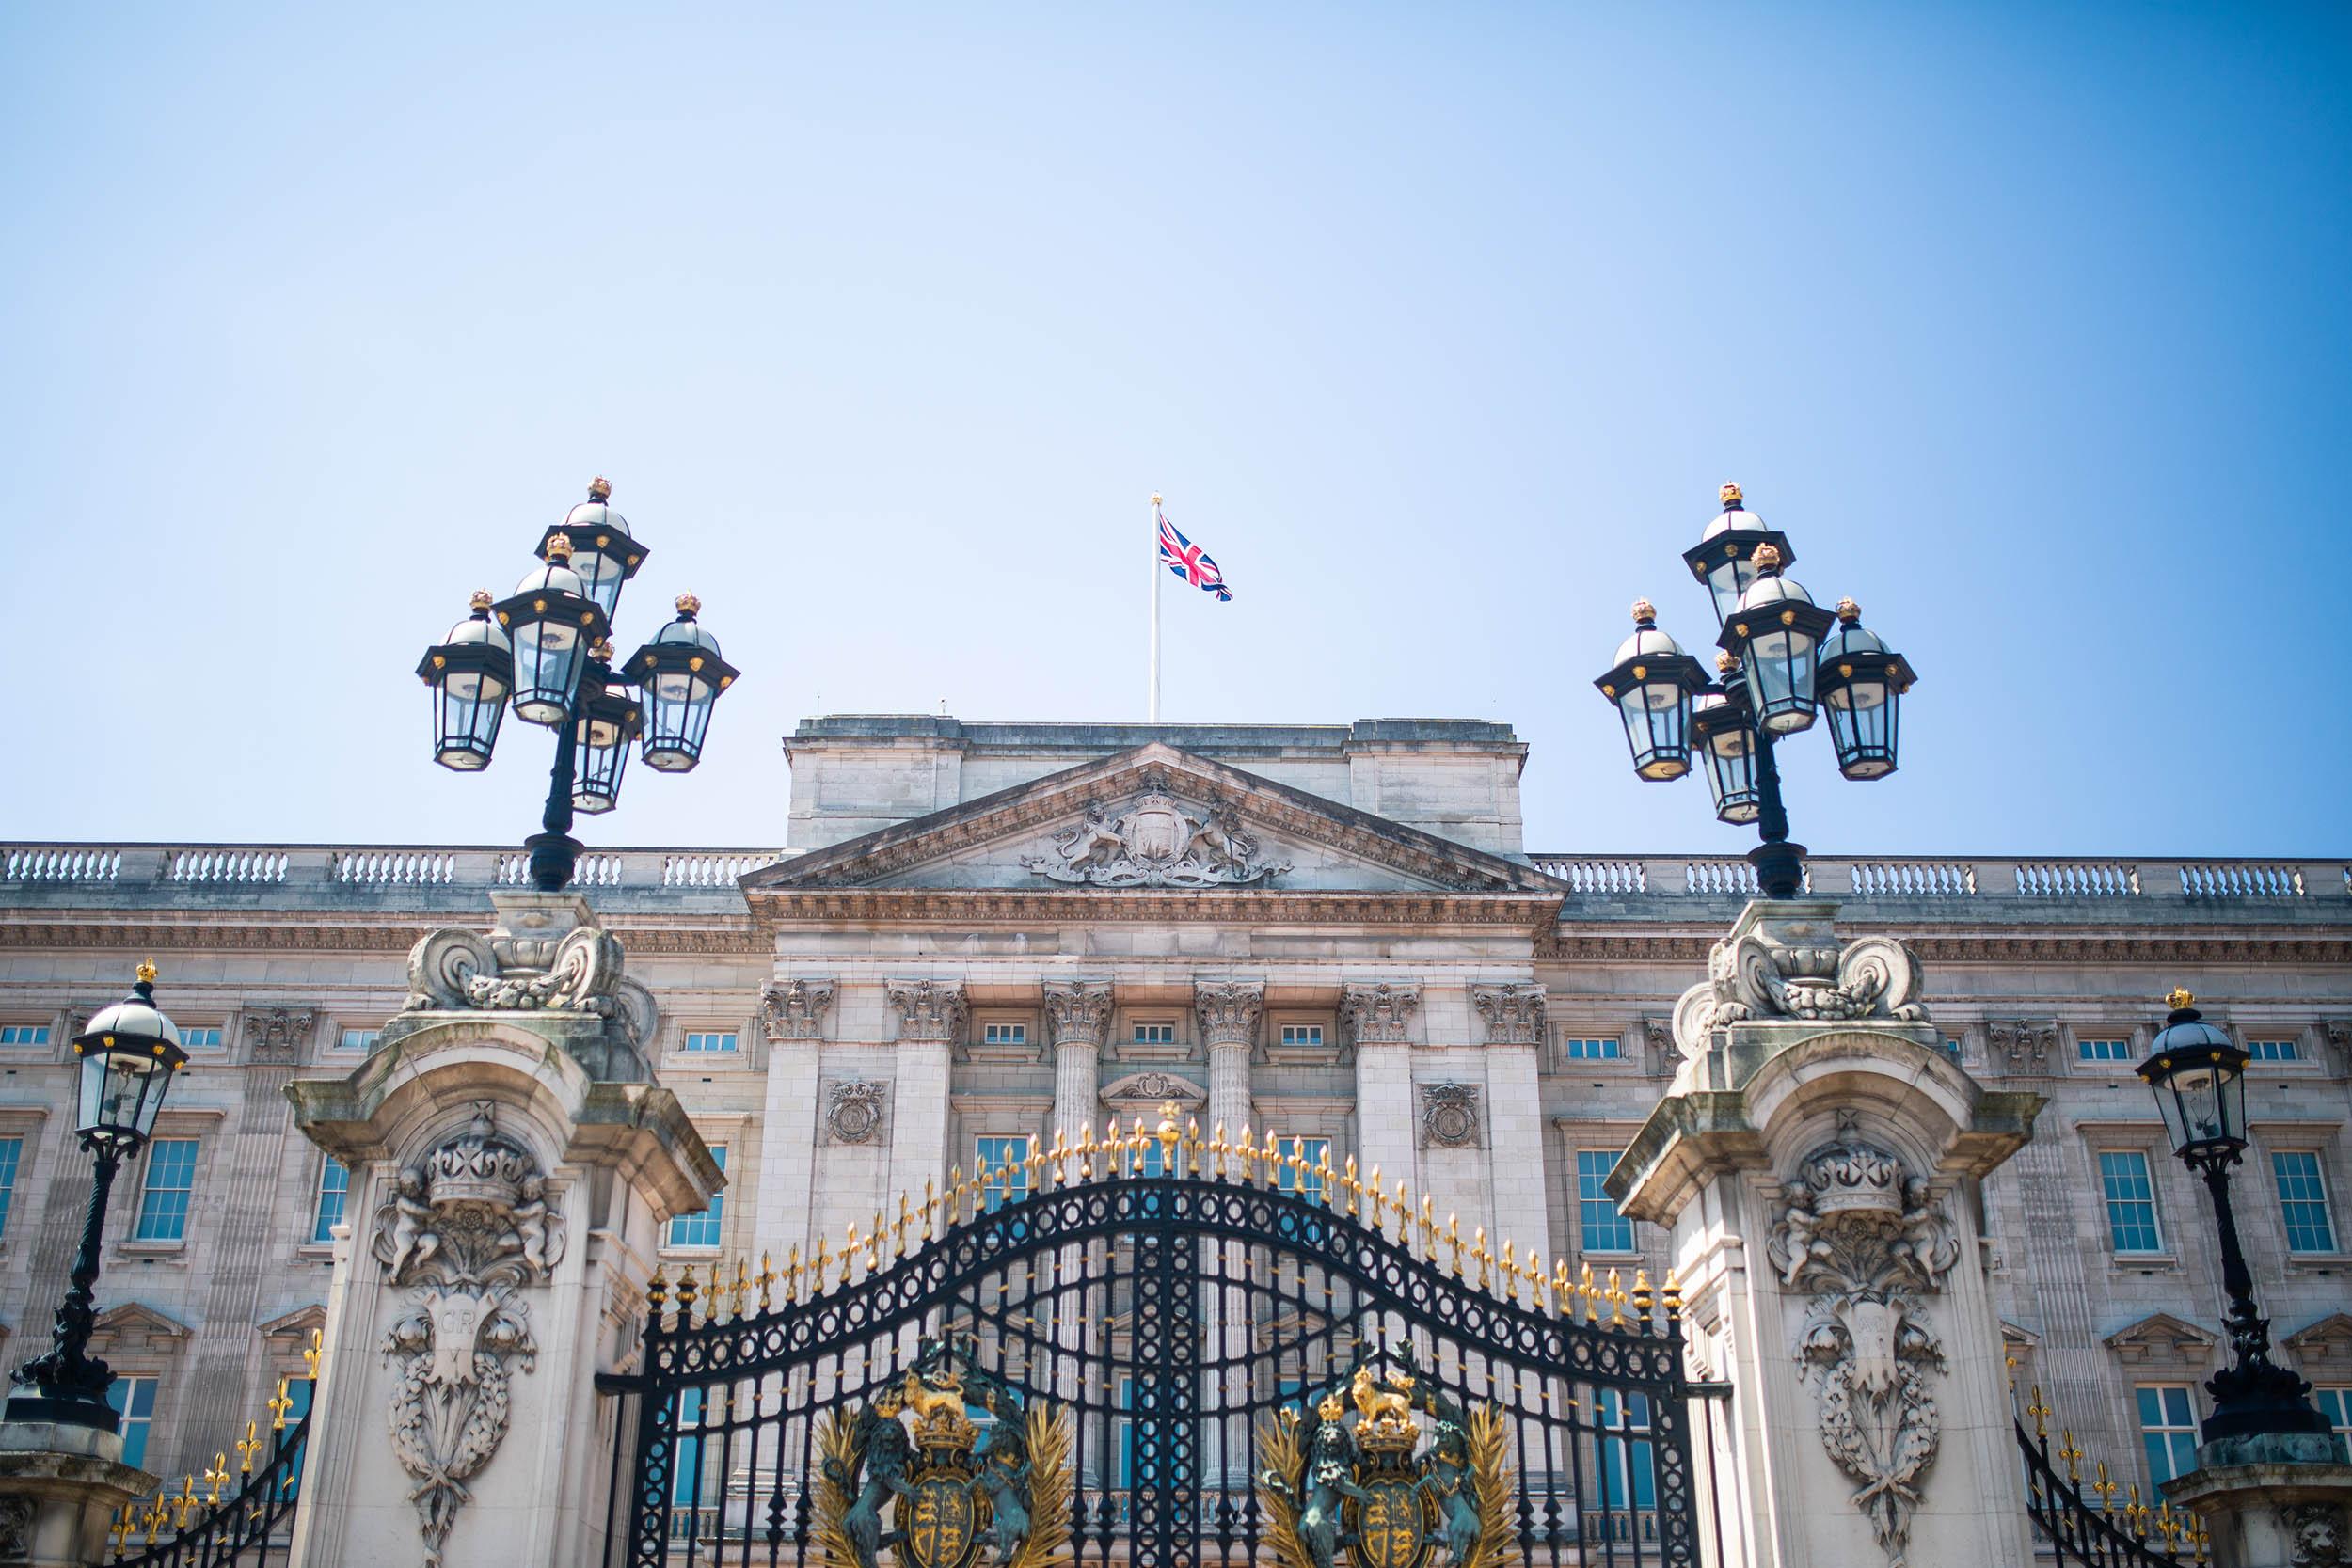 ENGLAND_LONDON_BUCKINGHAMPALACE_0007